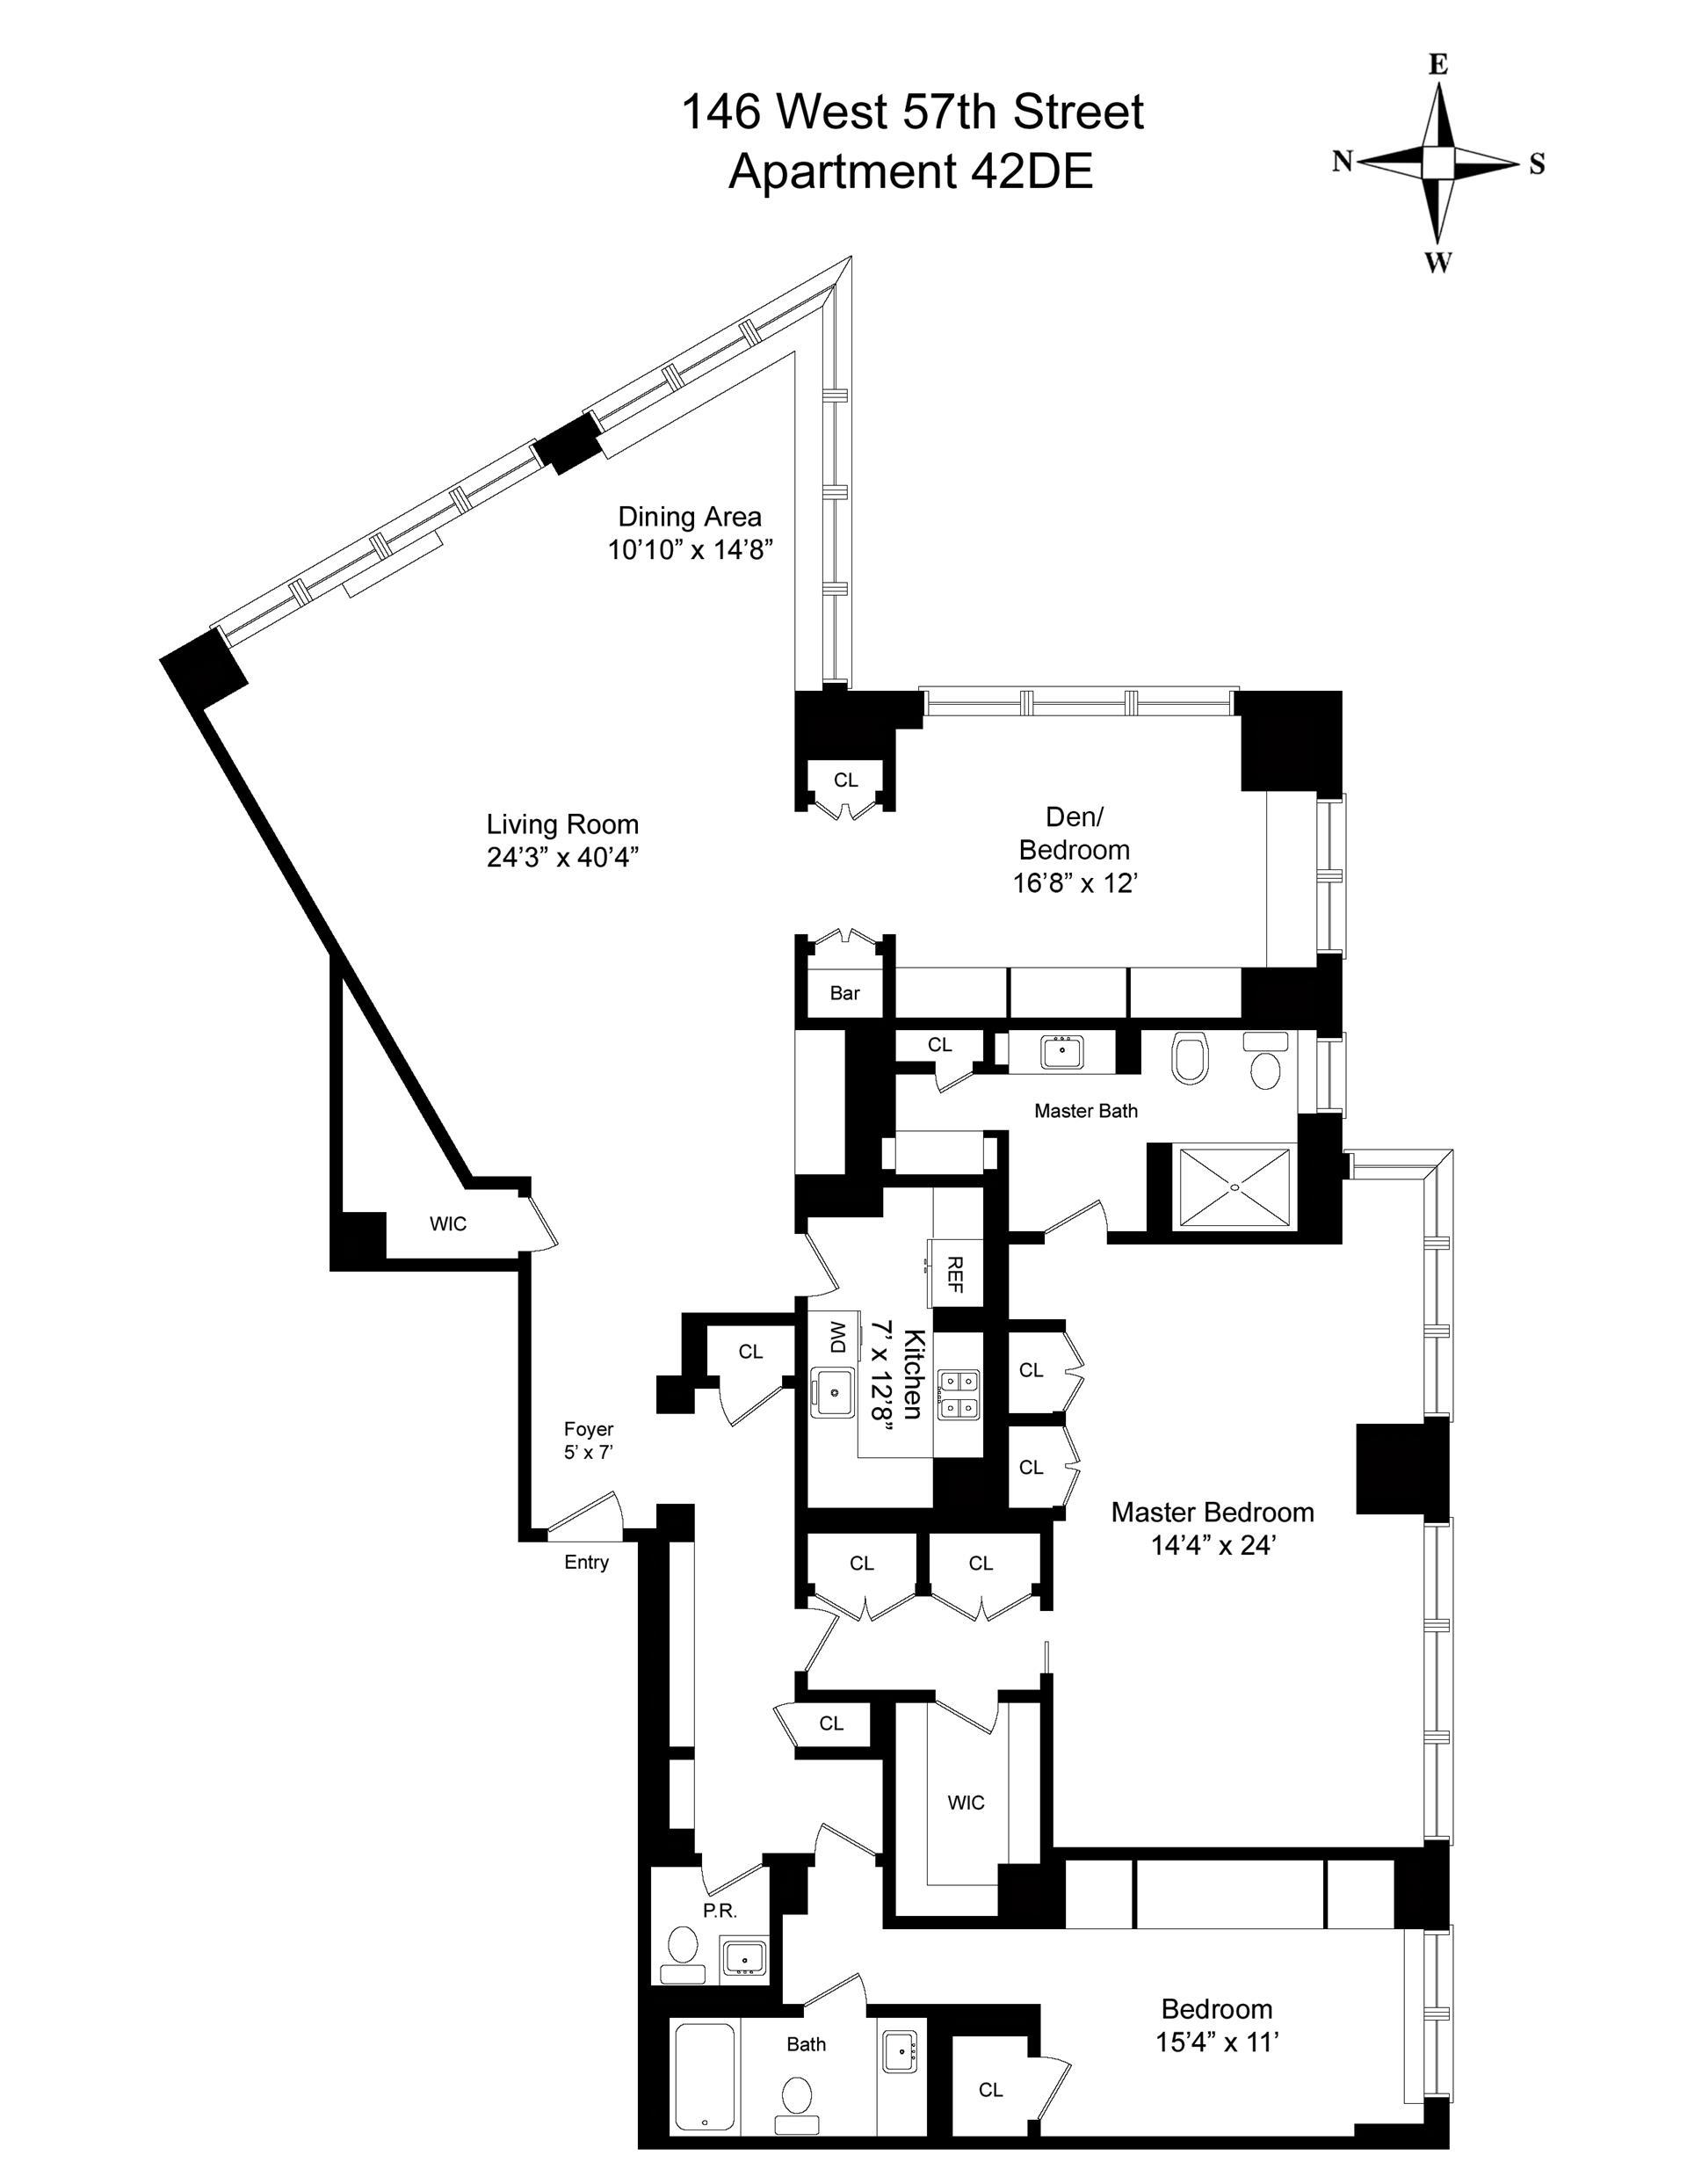 Floor plan of METROPOLITAN TOWER, 146 West 57th St, 42D - Midtown, New York